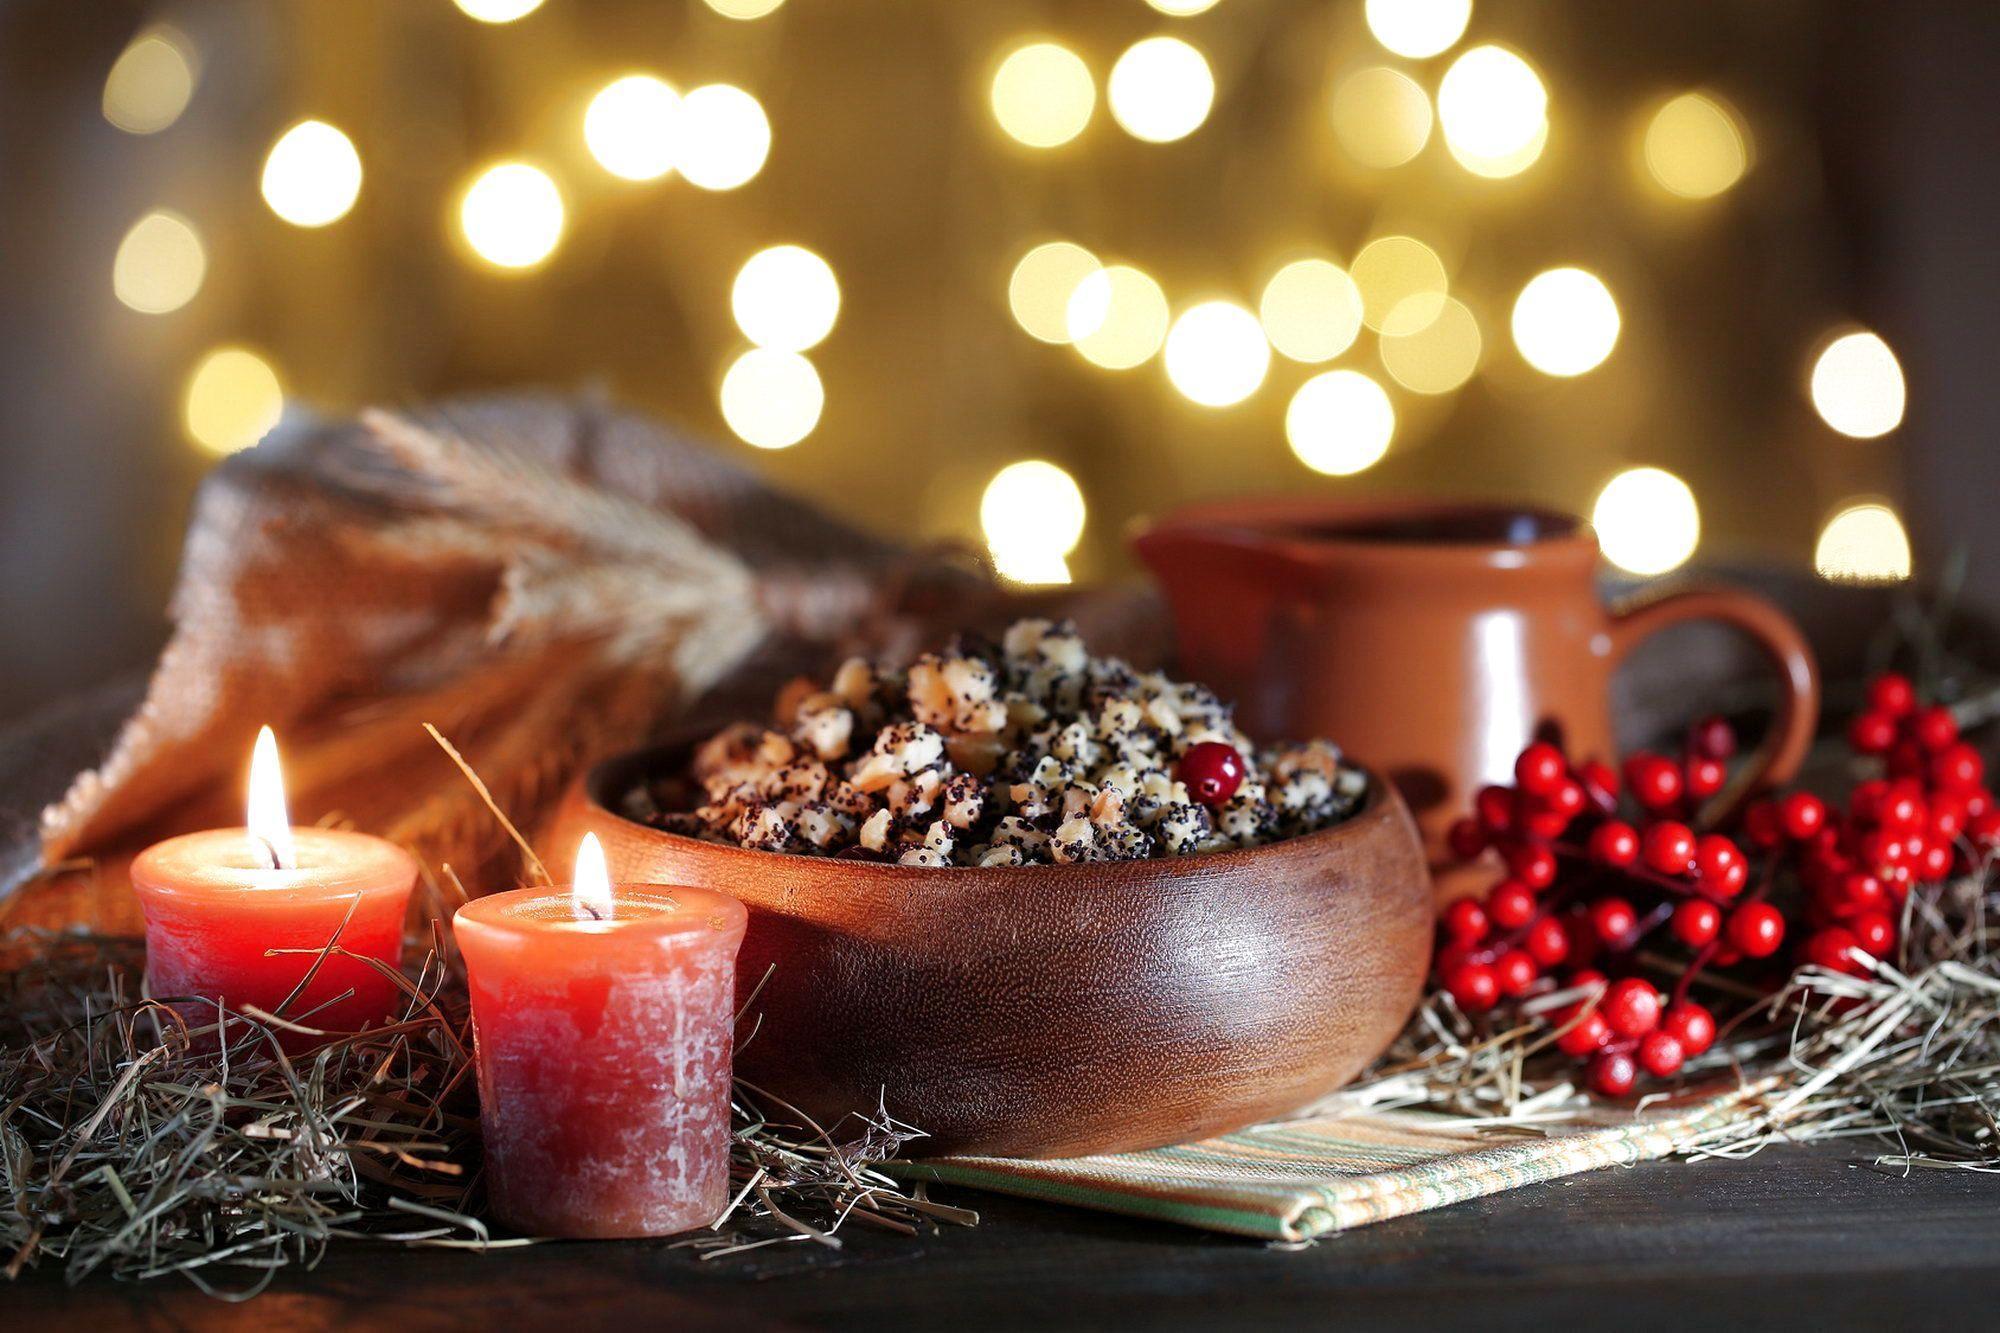 На Рождество украинцы готовят кутью